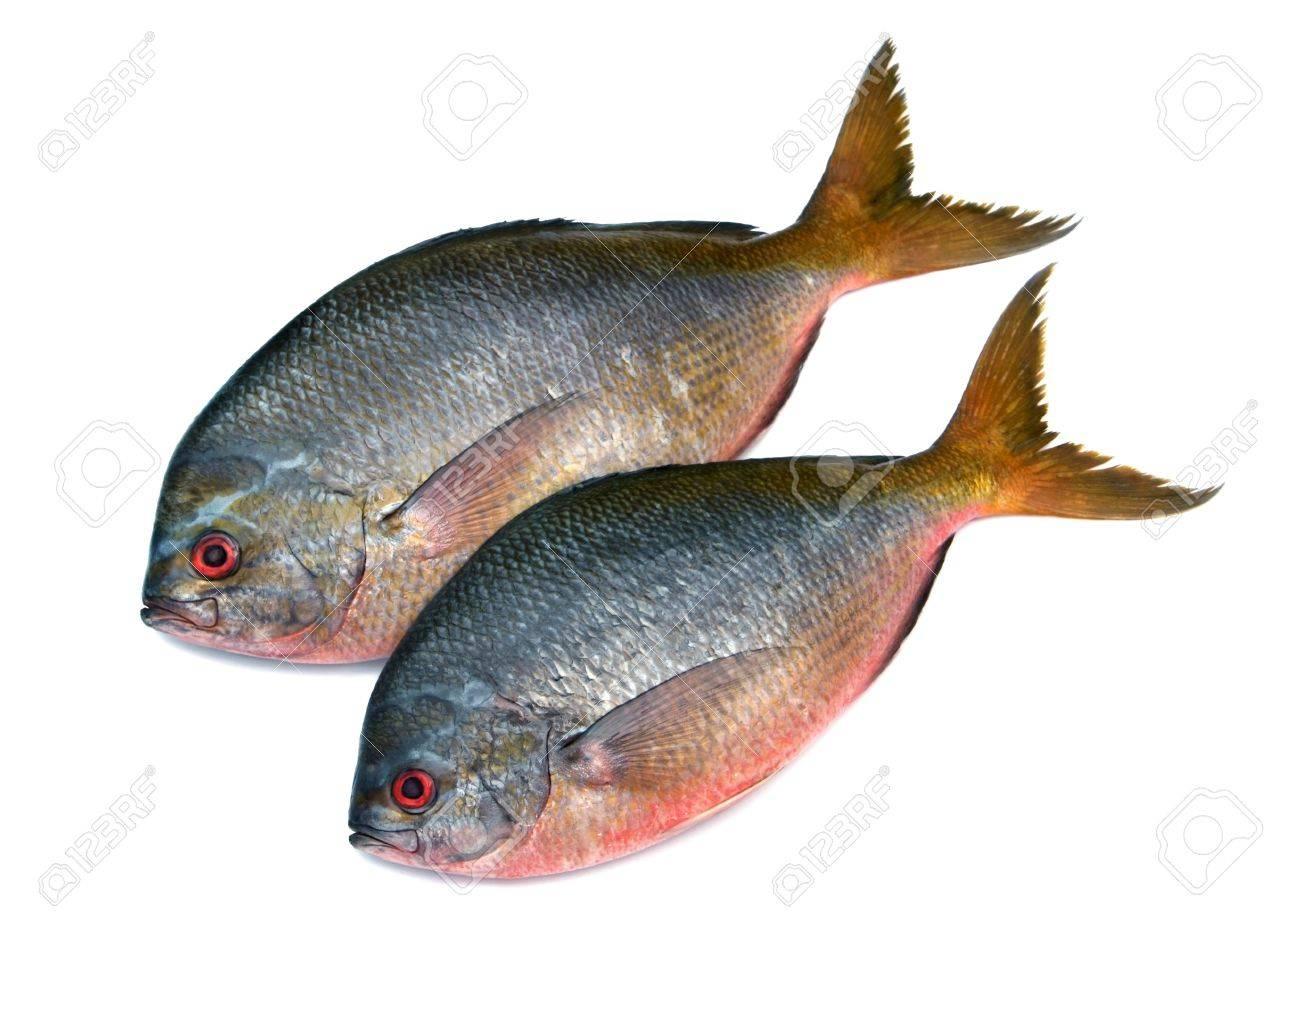 Yellowtail fusilier fish isolated on white background Stock Photo - 15449782